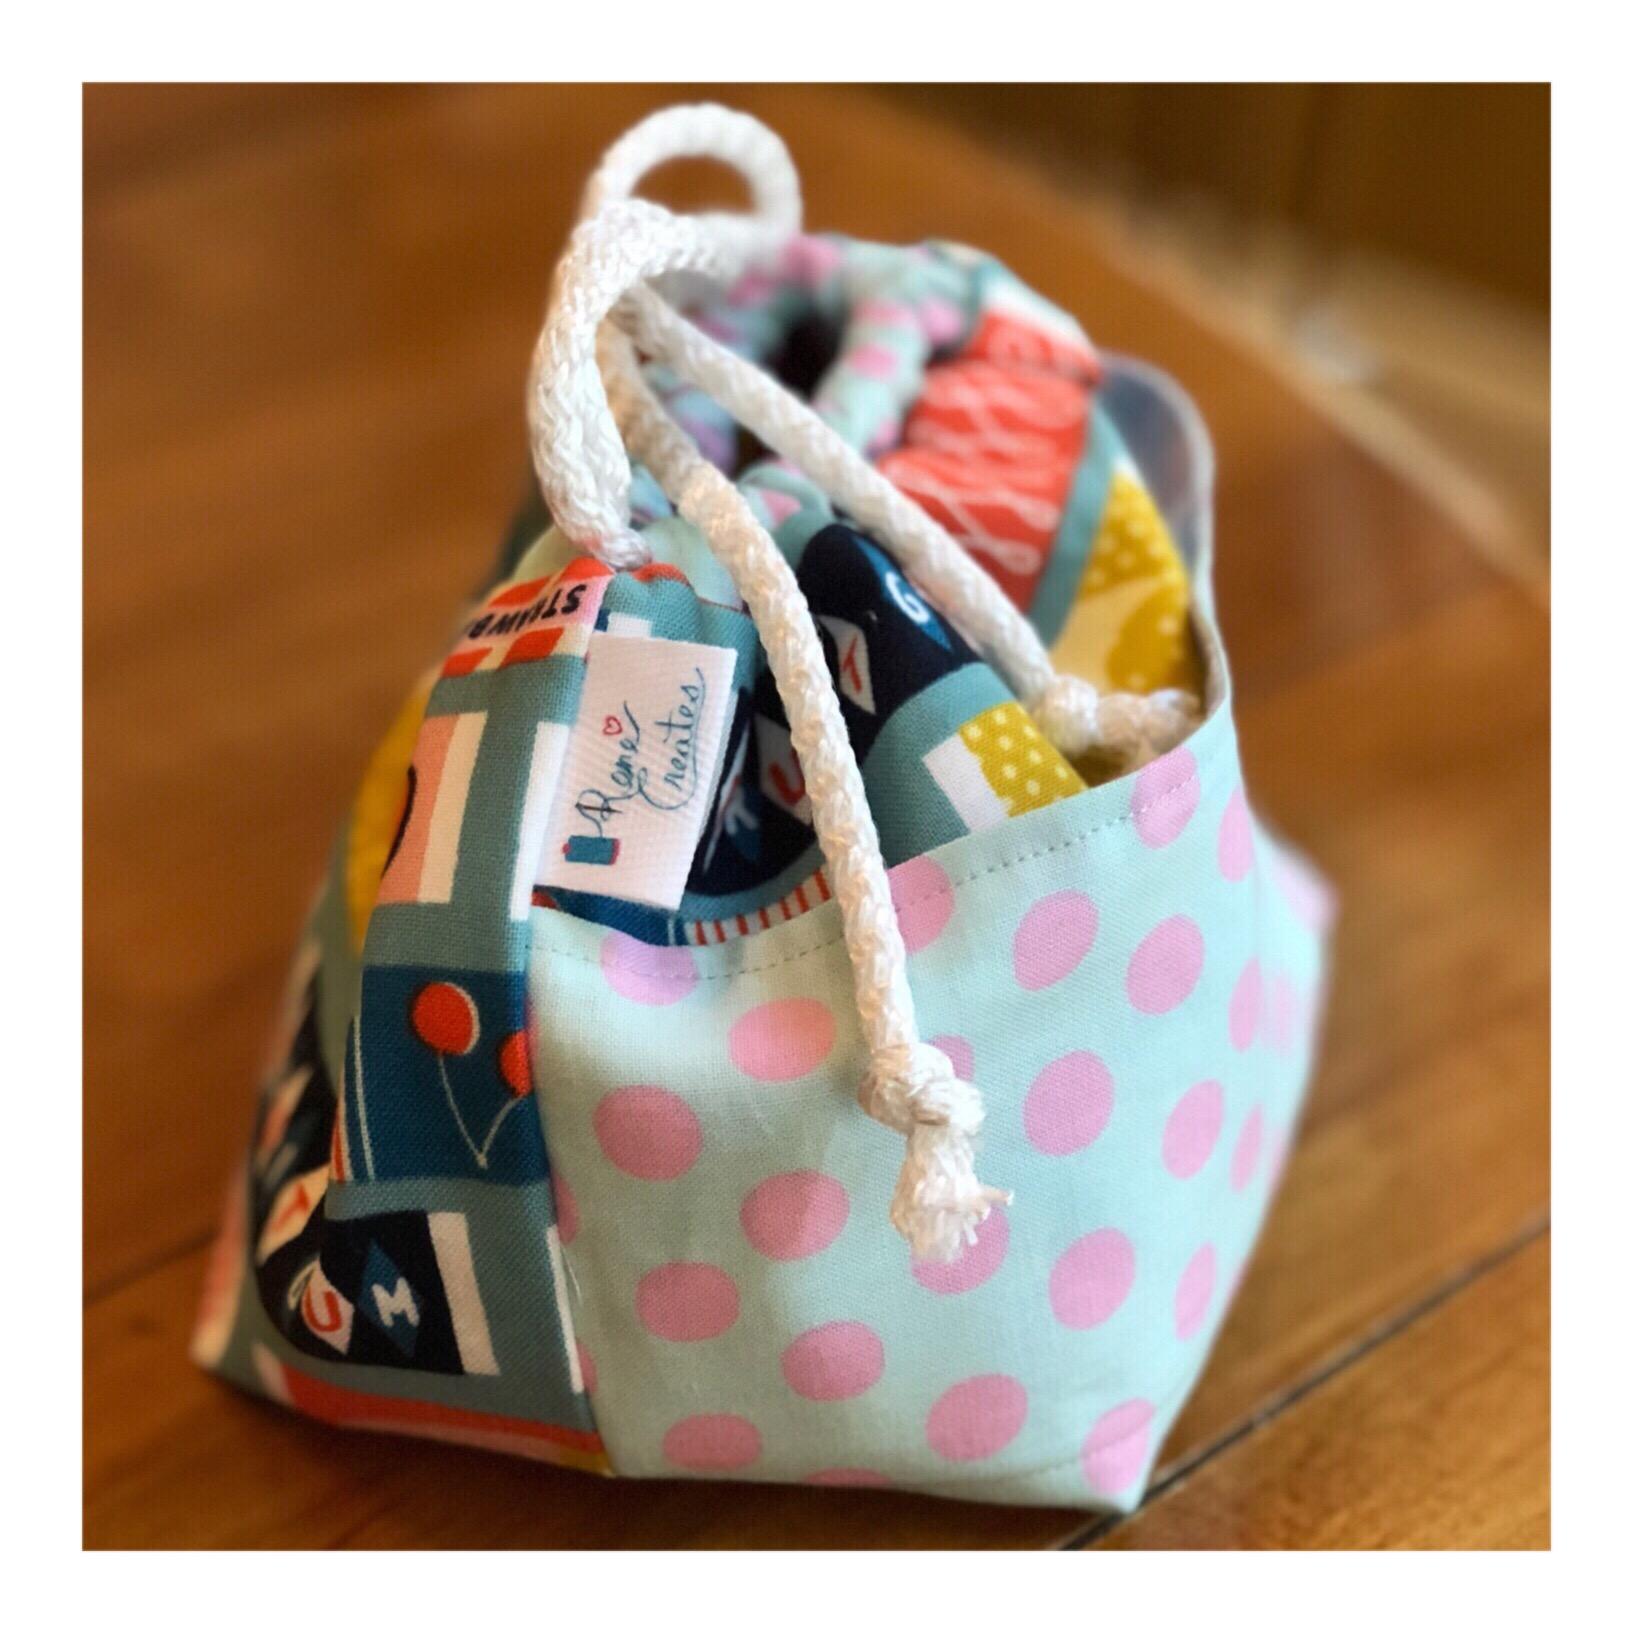 Wee Braw Bag #4